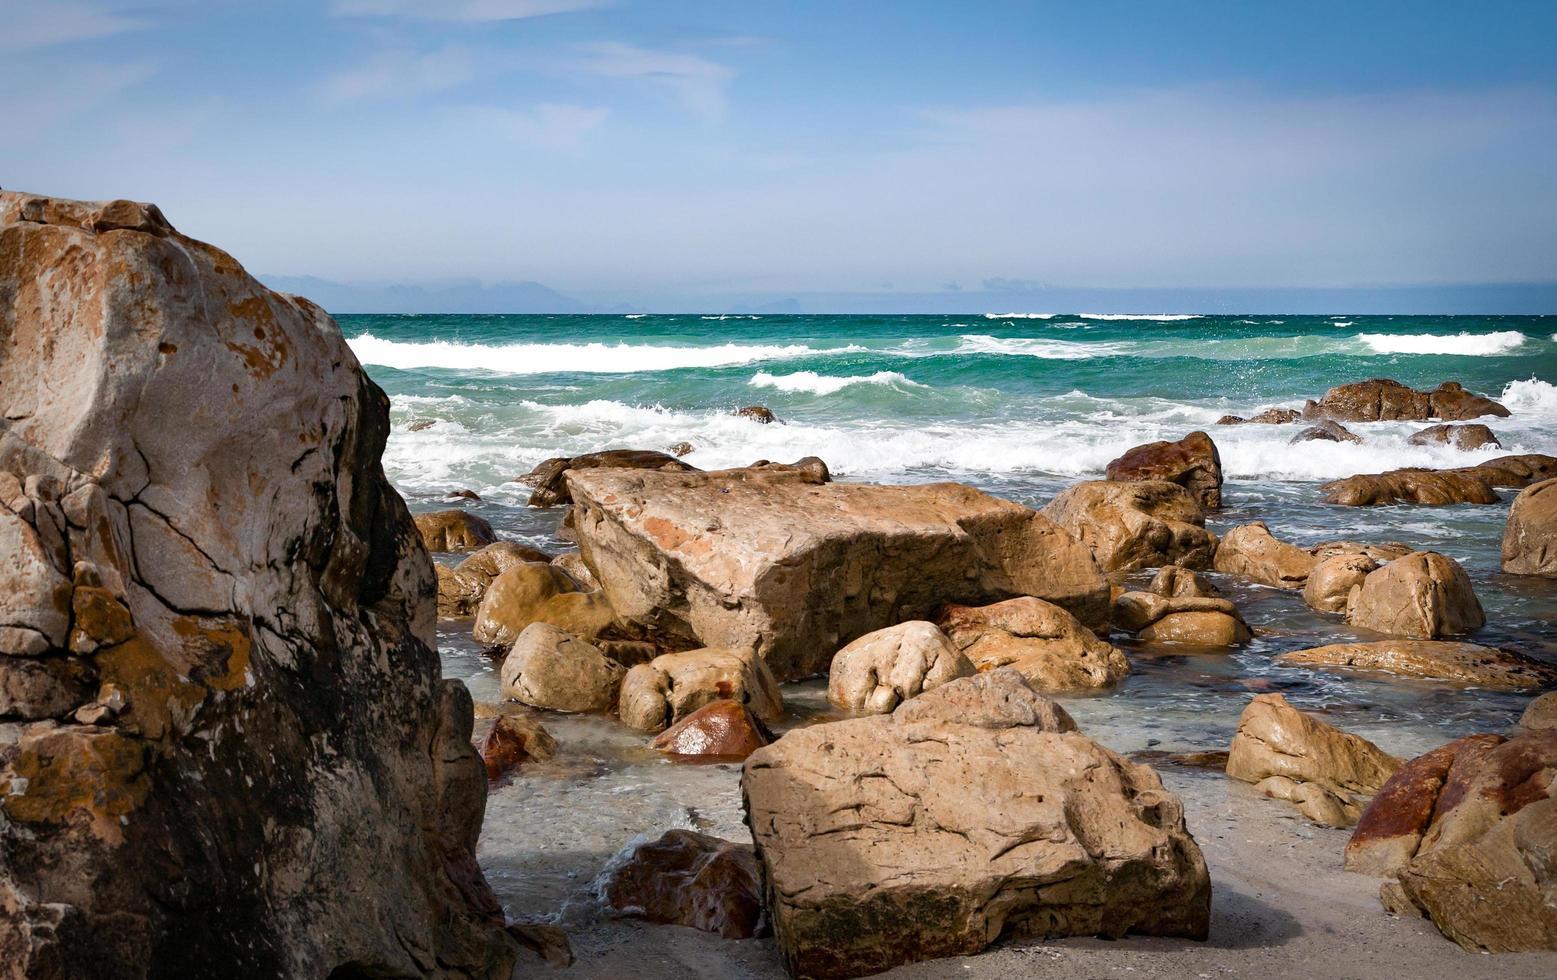 Seashore with rocks under blue sky photo